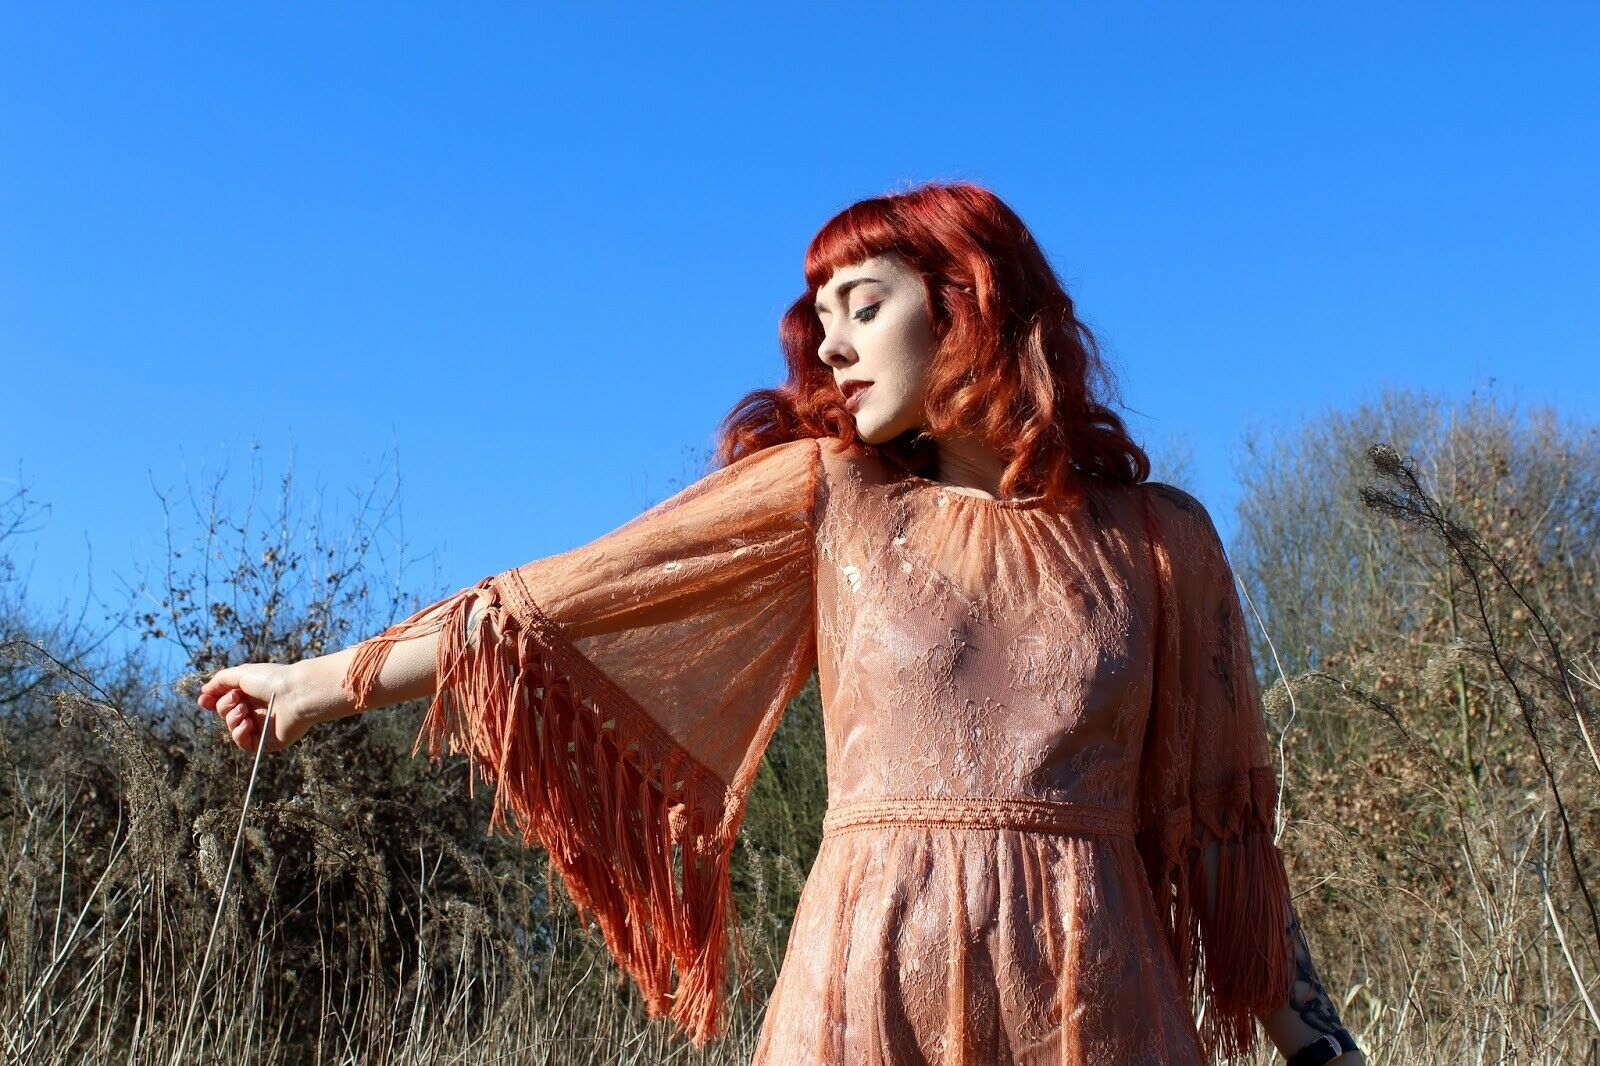 Cari's Closit Closit Closit Burnt Tassel Yasmine Playsuit Dress - Size  8 dc4a00